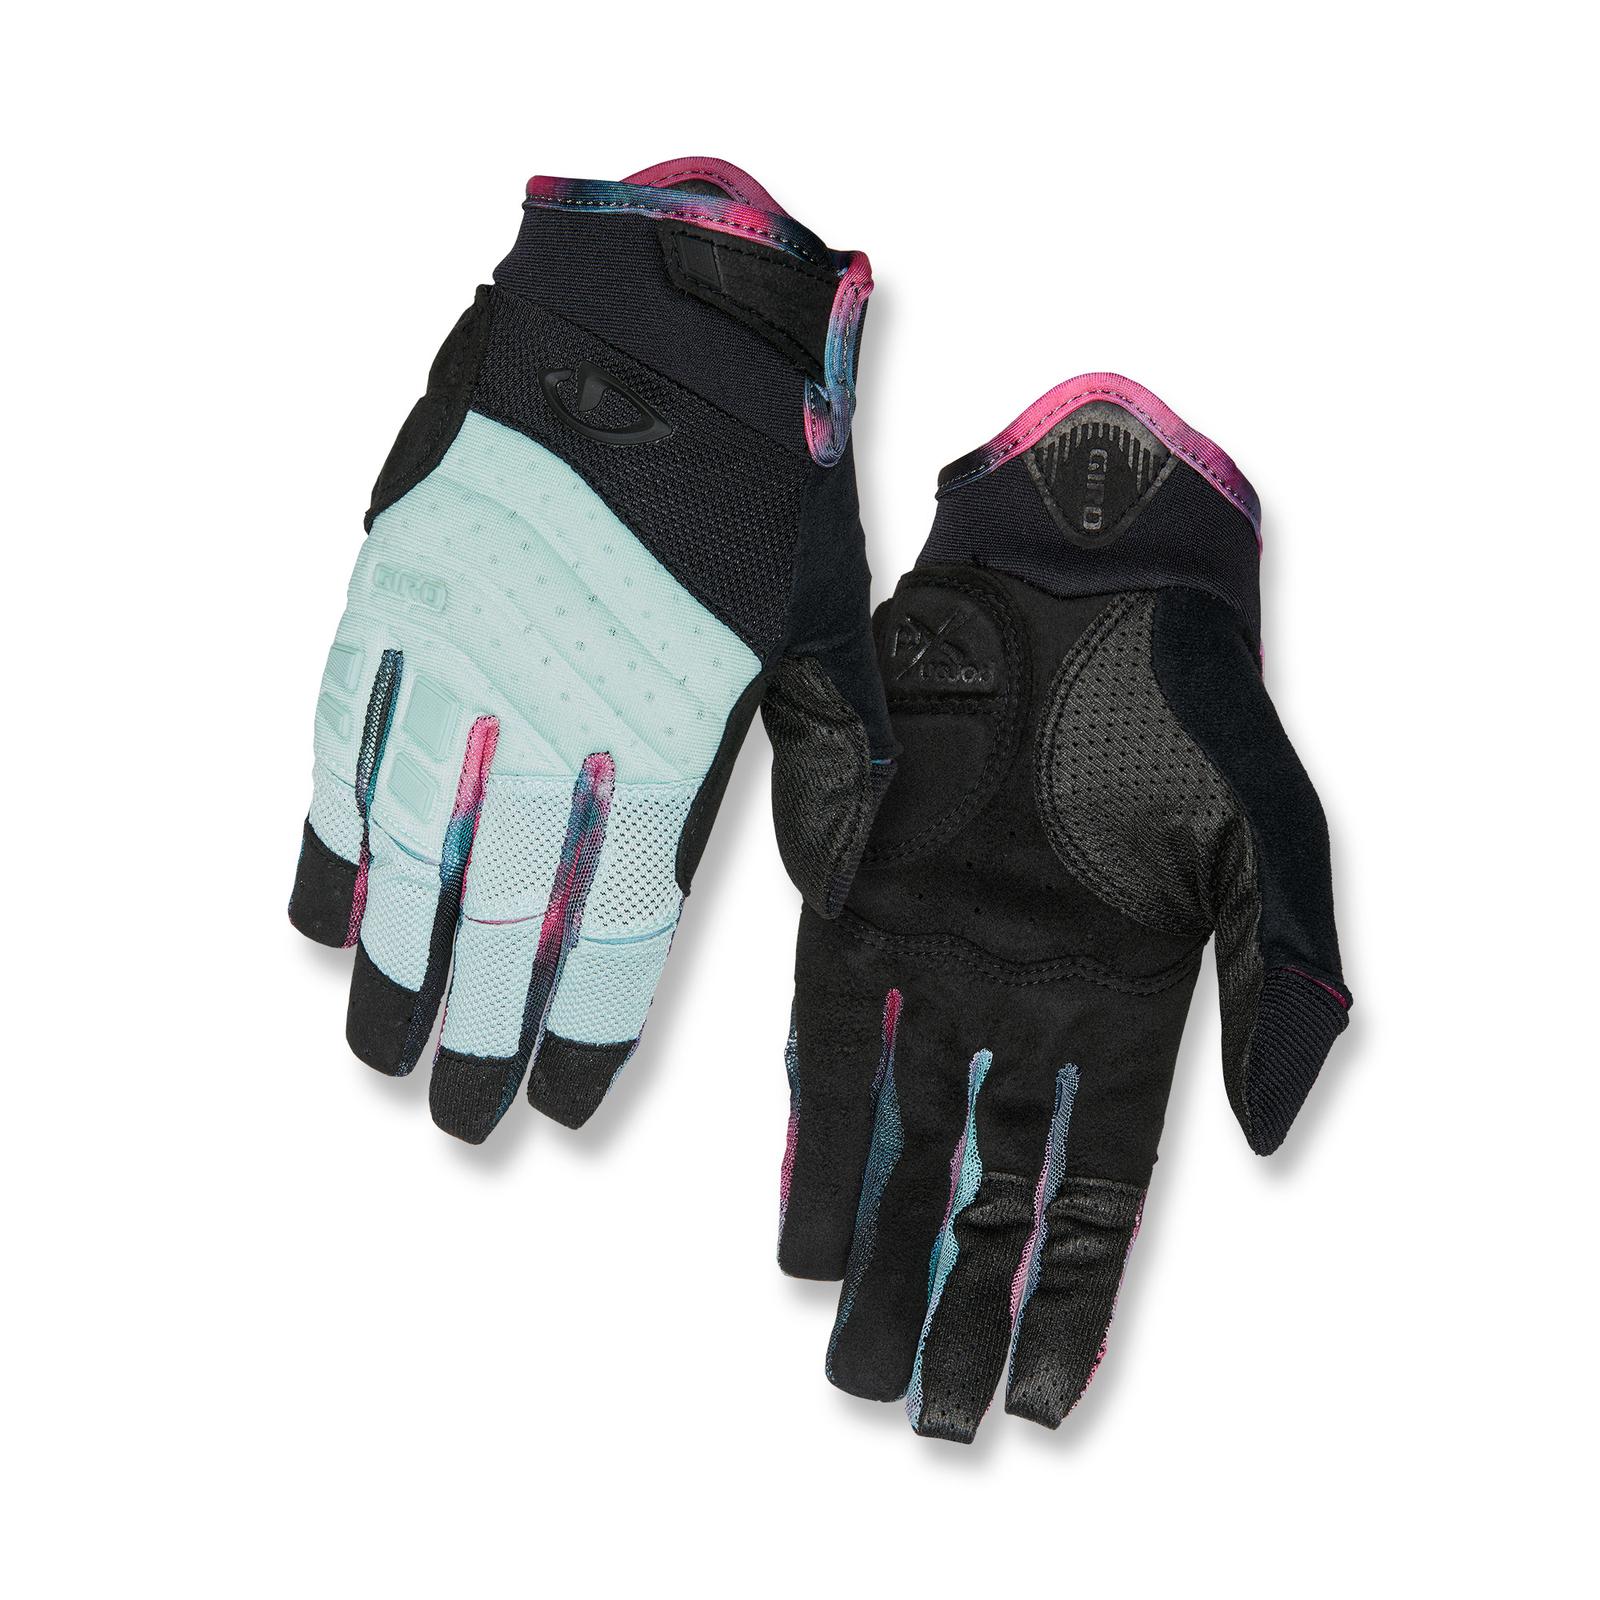 giro xena damen fahrrad handschuhe kurz mint gr n schwarz. Black Bedroom Furniture Sets. Home Design Ideas